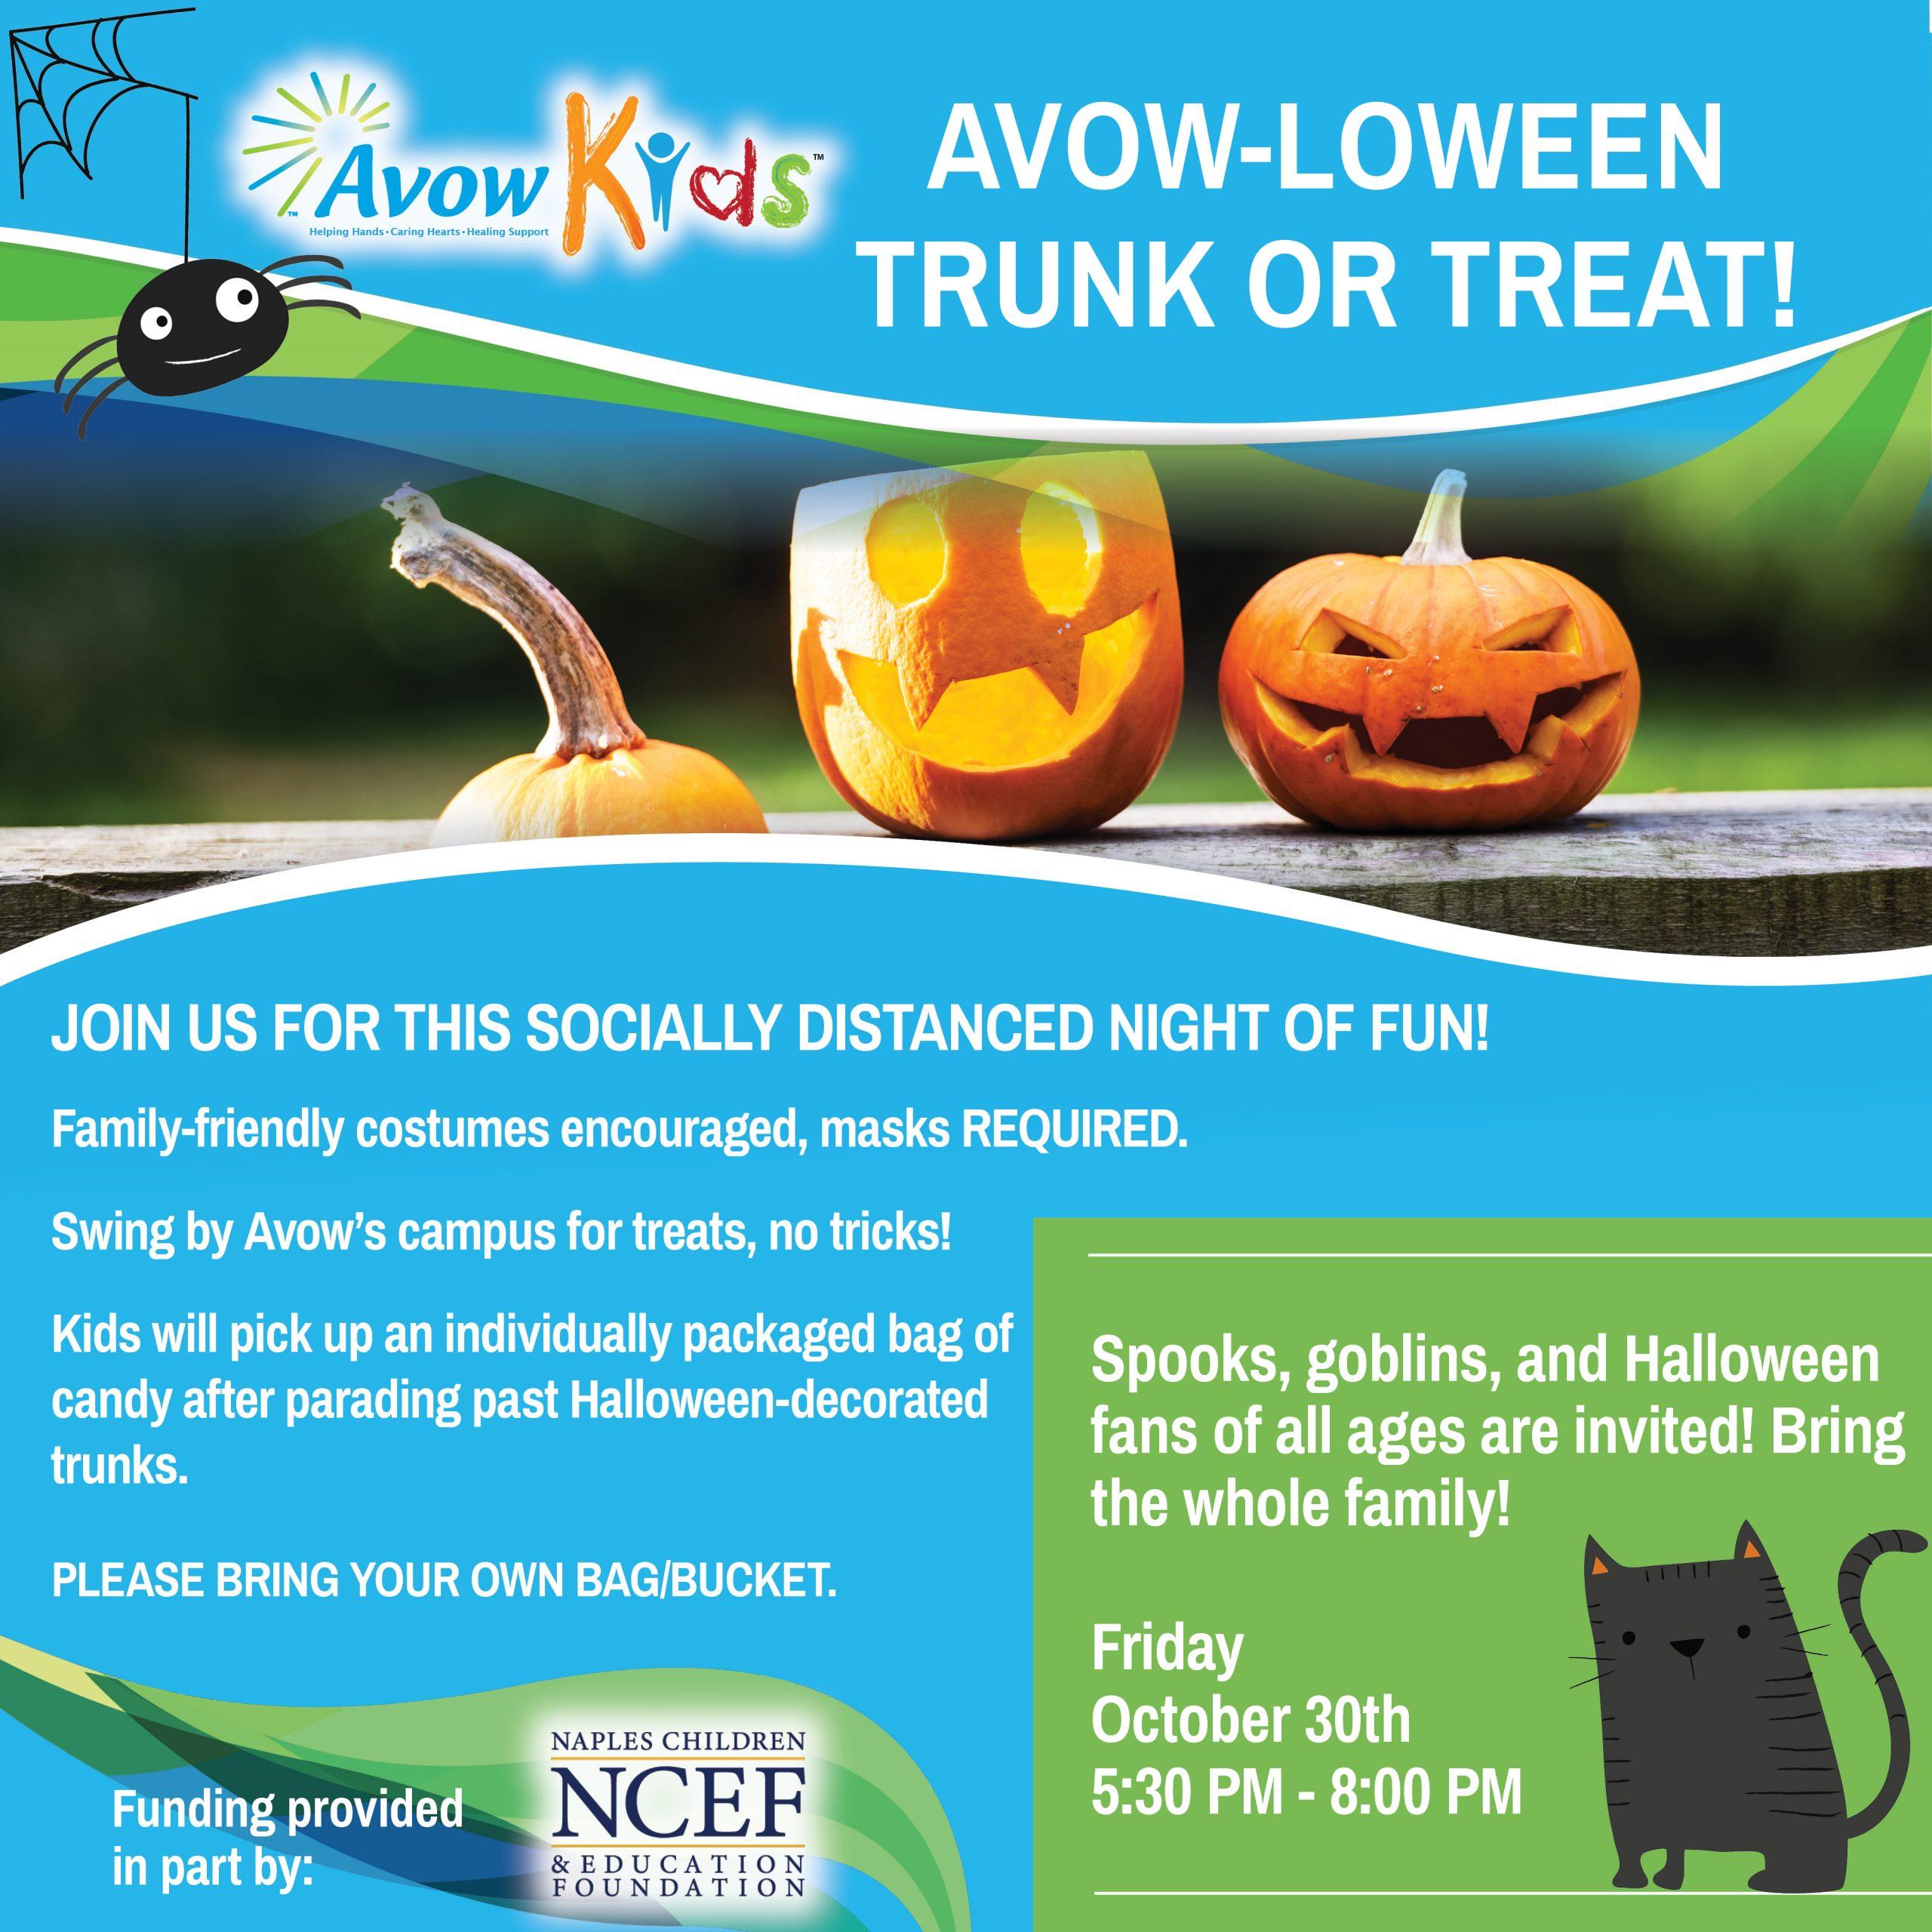 Avow-loween Trunk or Treat! 9-28-2020